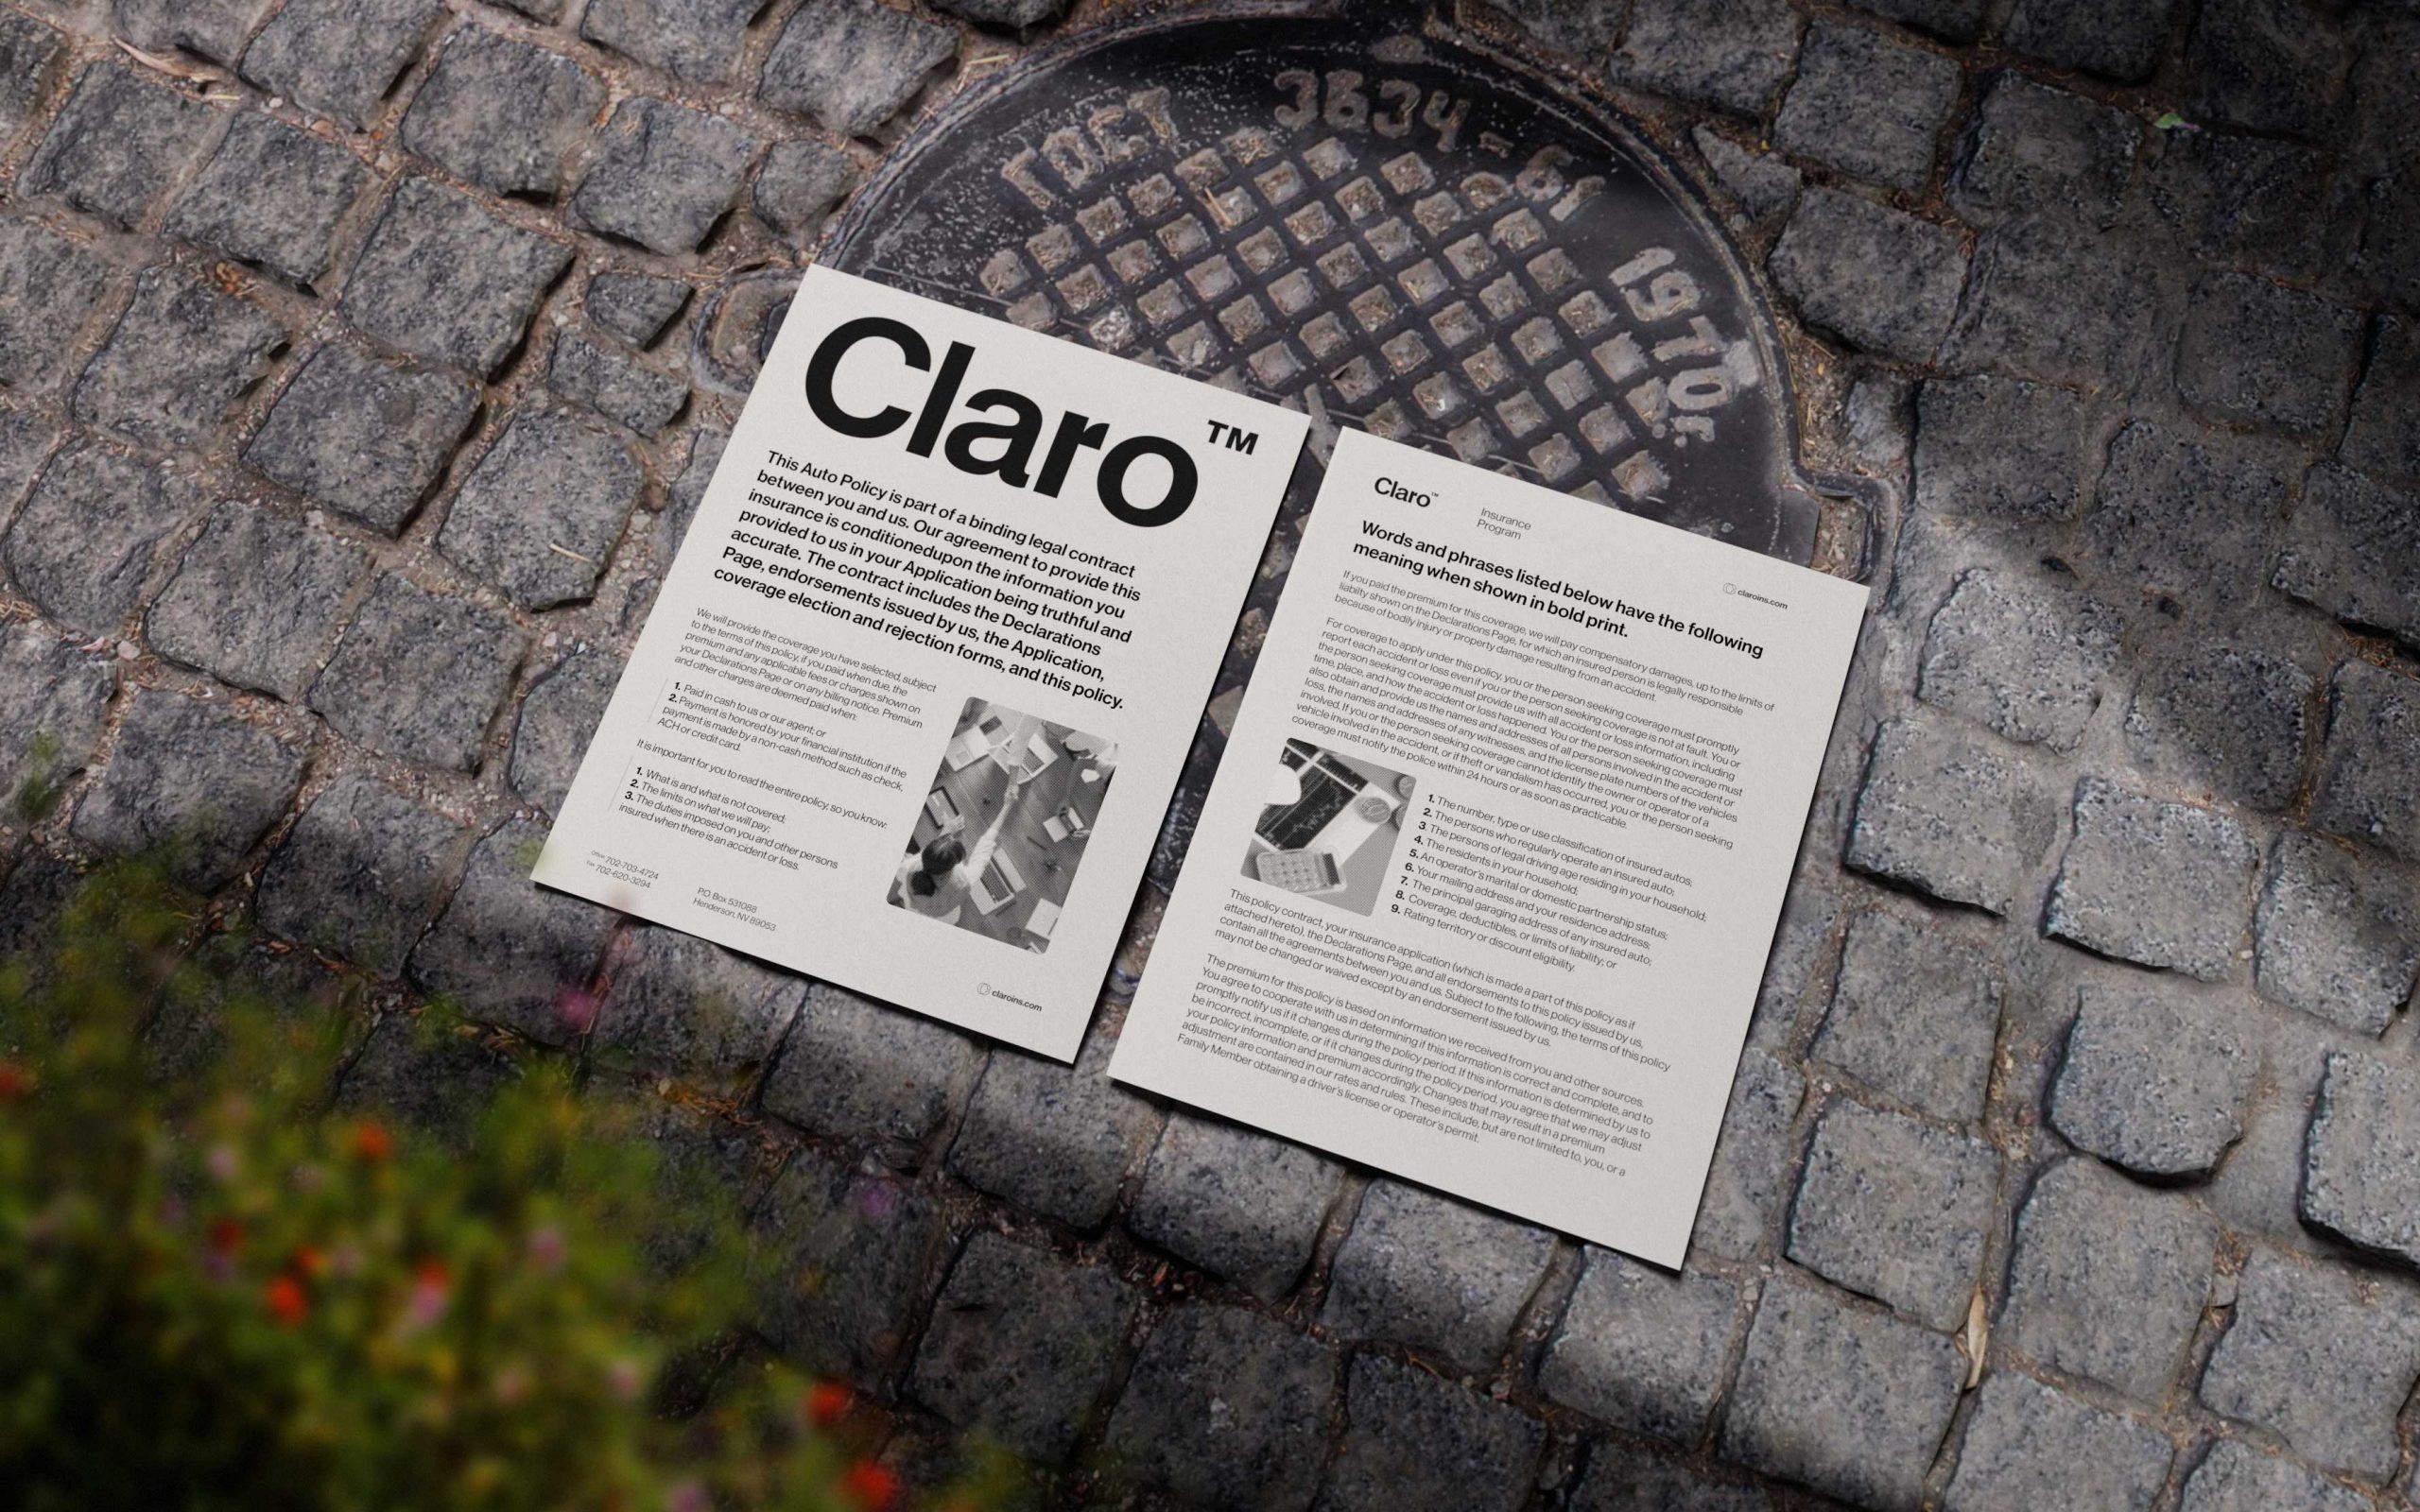 Claro-010